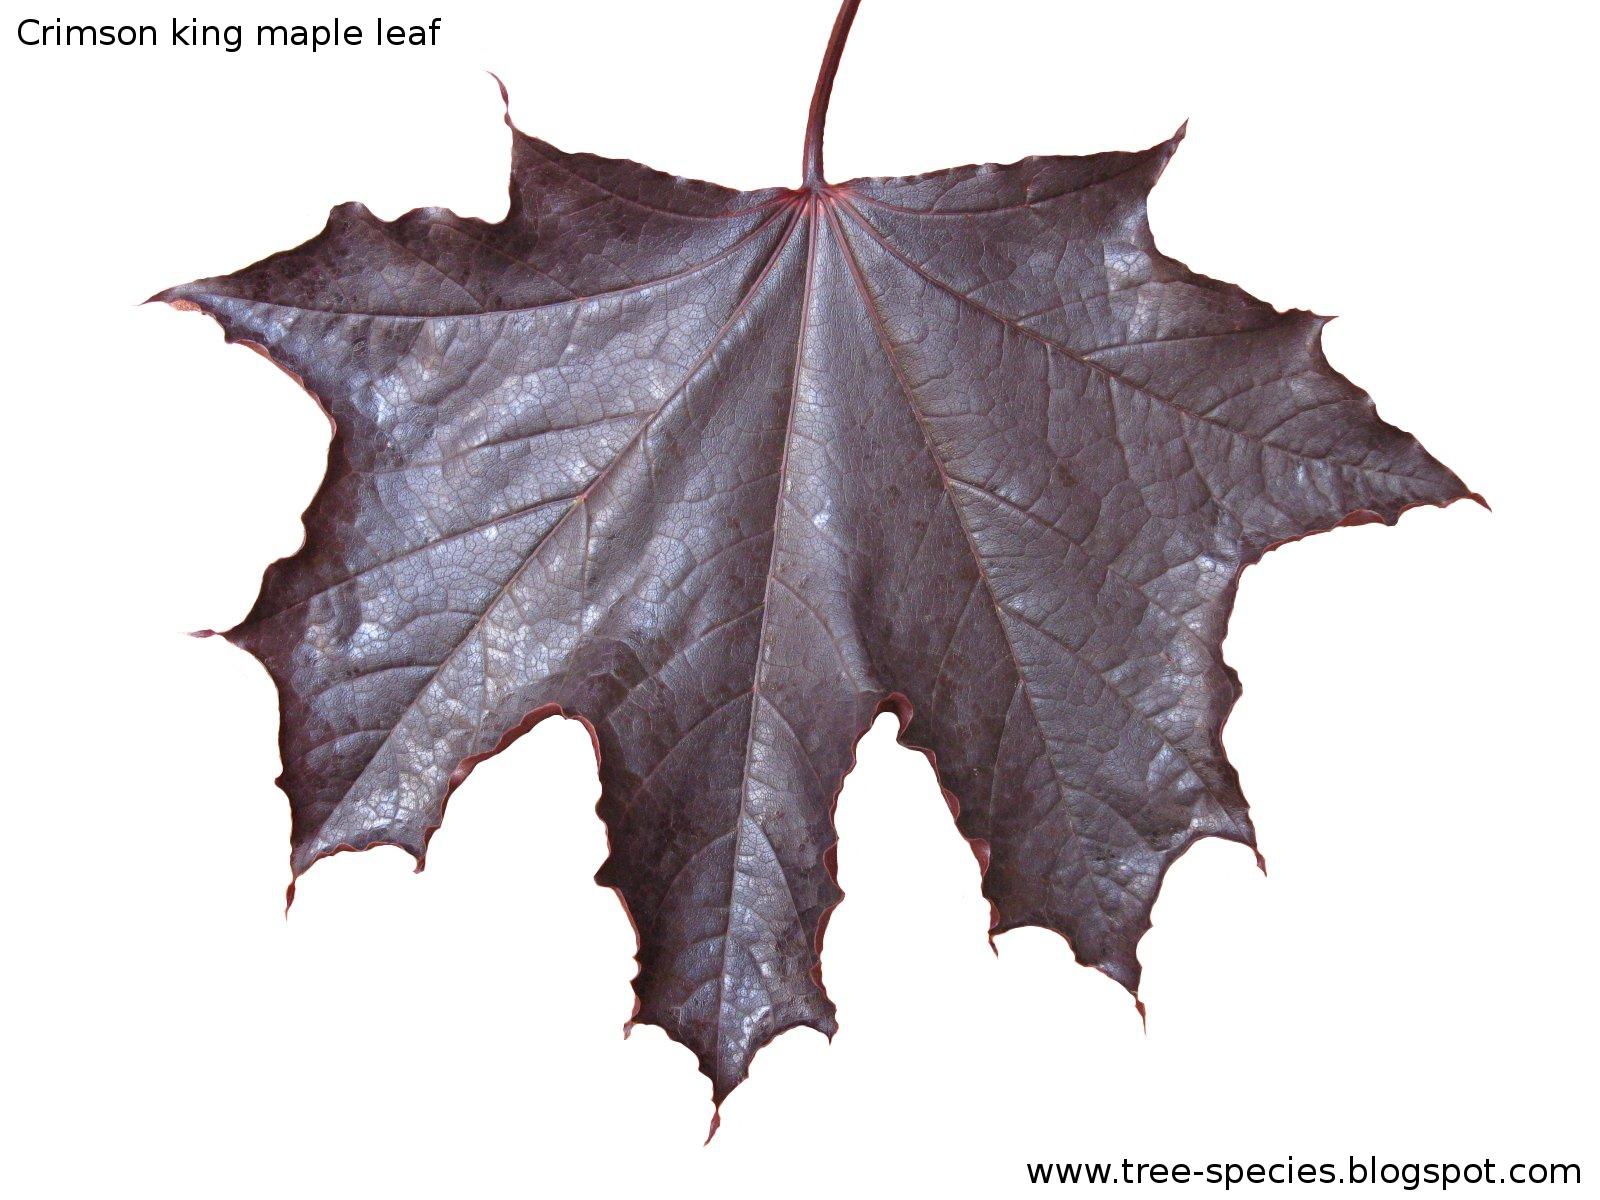 The World S Tree Species Crimson King Maple Leaf